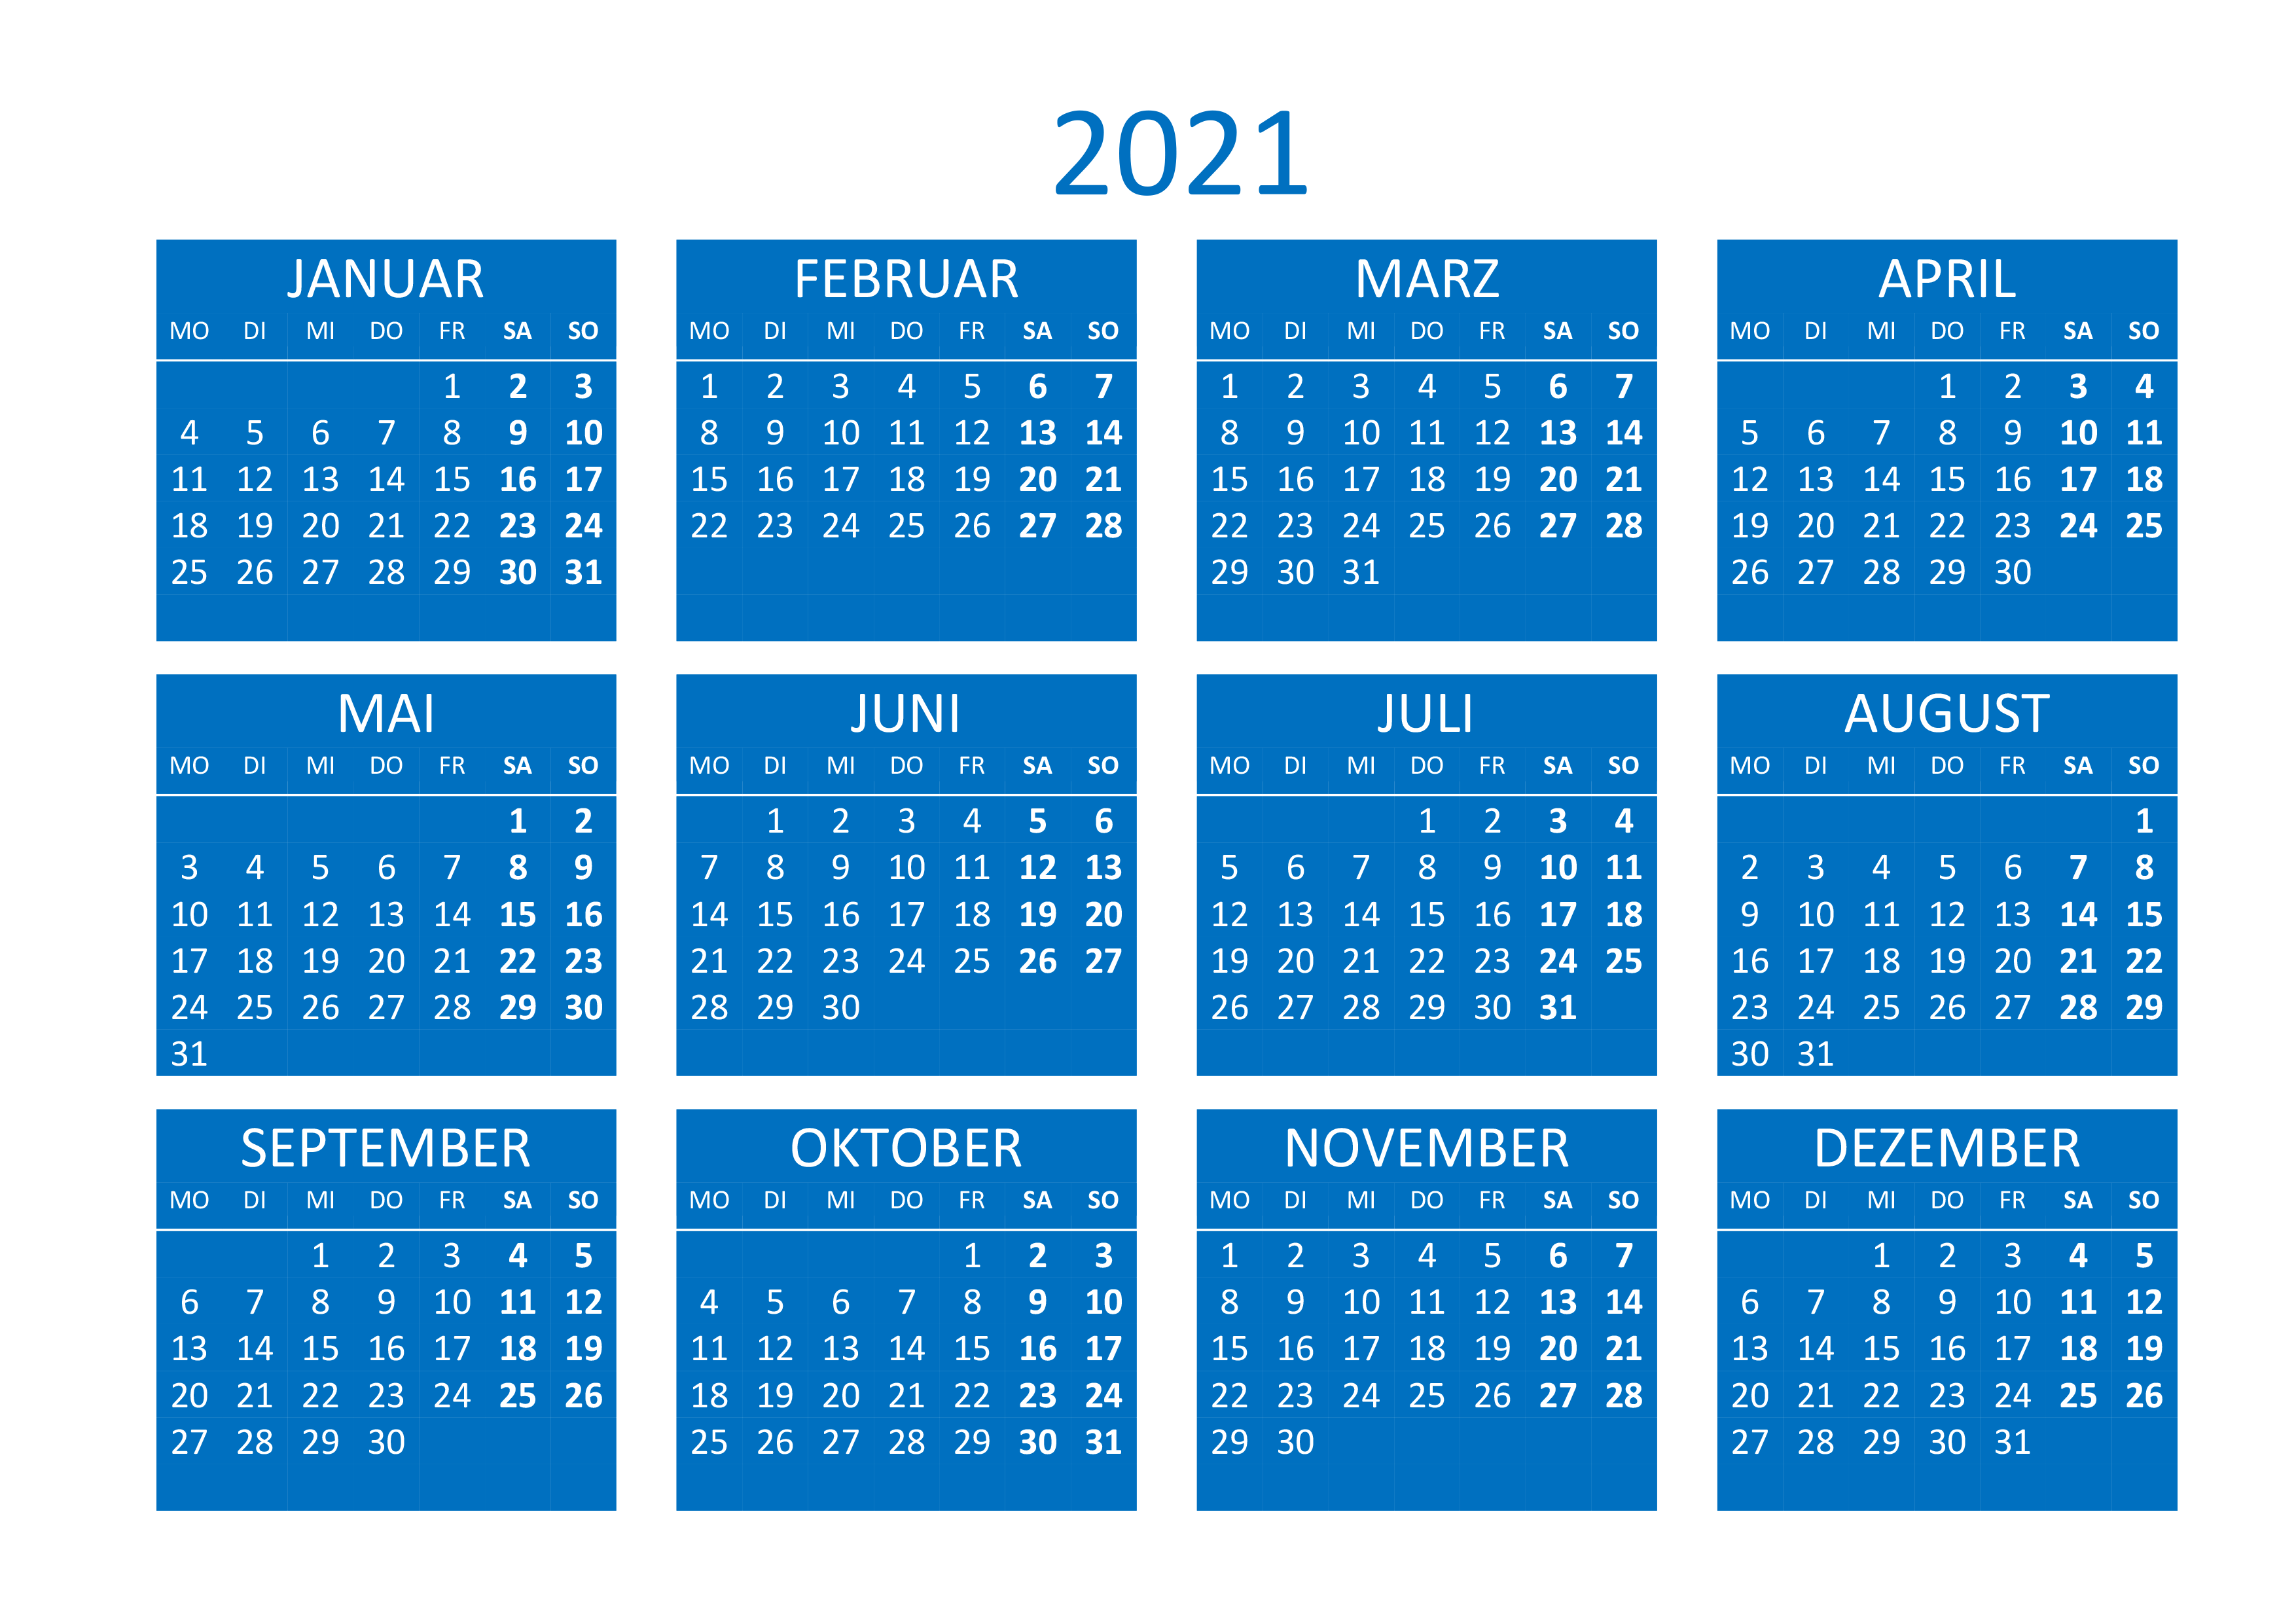 Jahreskalender 2021 horizontal - kalender.su